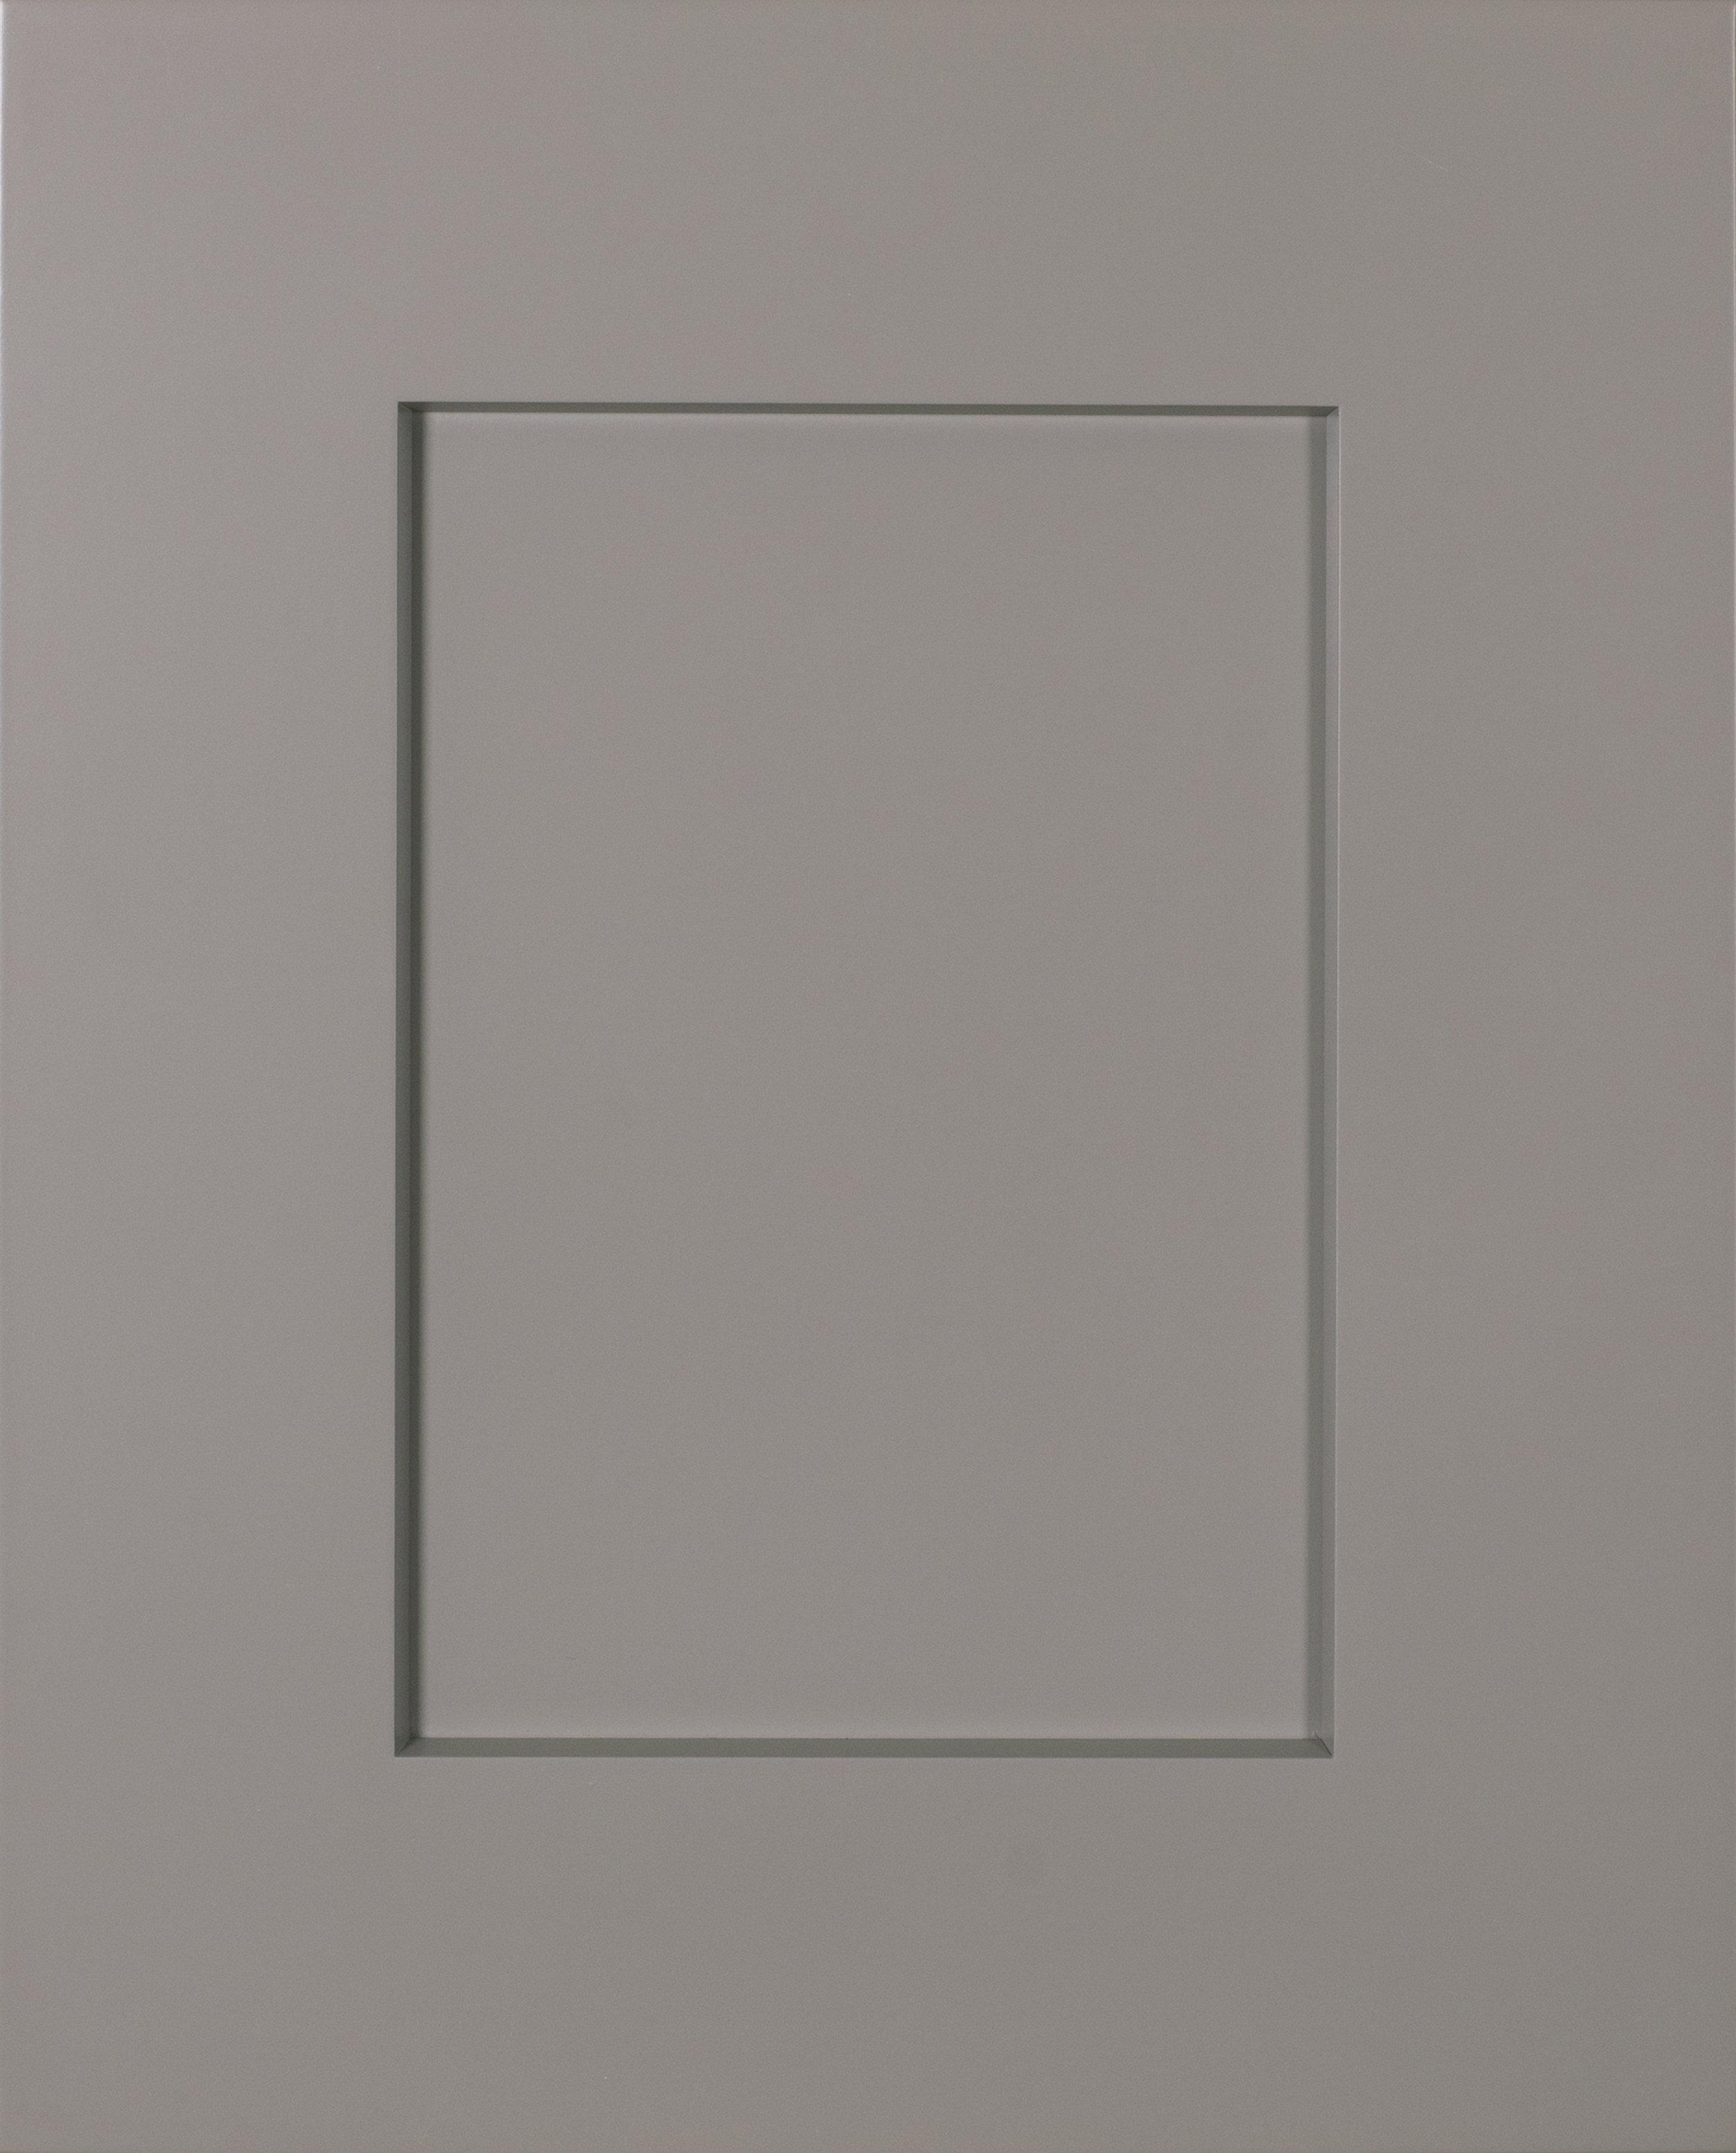 Olympic - Reverse Raised Center PanelCherry | Maple | Paint | Rustic Beech | White OakShown in Mist Paint